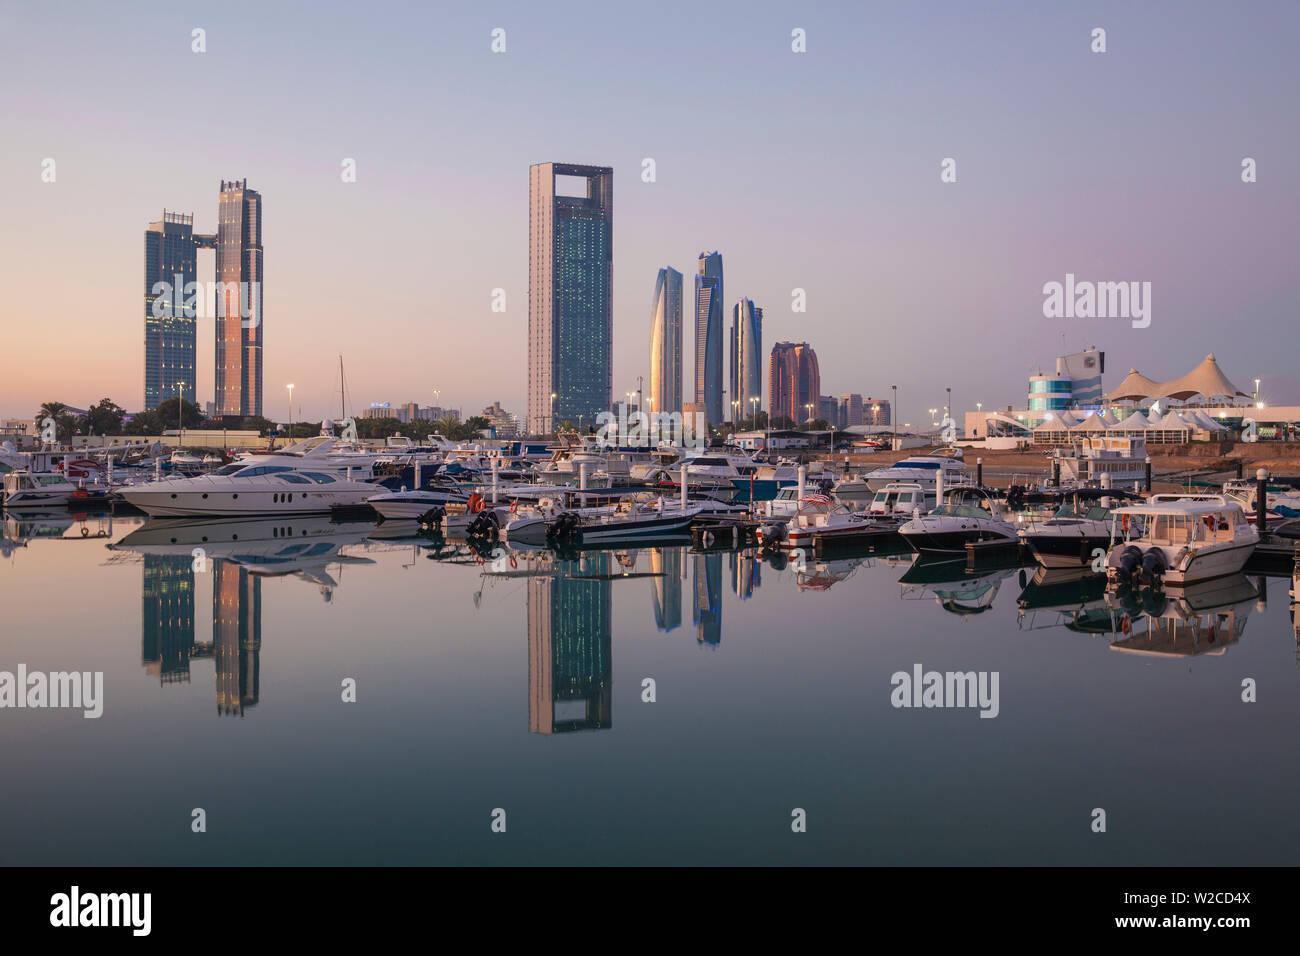 United Arab Emirates, Abu Dhabi, View of Marina and City skyline looking towards St Regis Hotel, Abu Dhabi National Oil Company headquarters, Etihad Towers, The Royal Rose Hotel and to the right the Abu Dhabi International Marine Sports Club - Stock Image